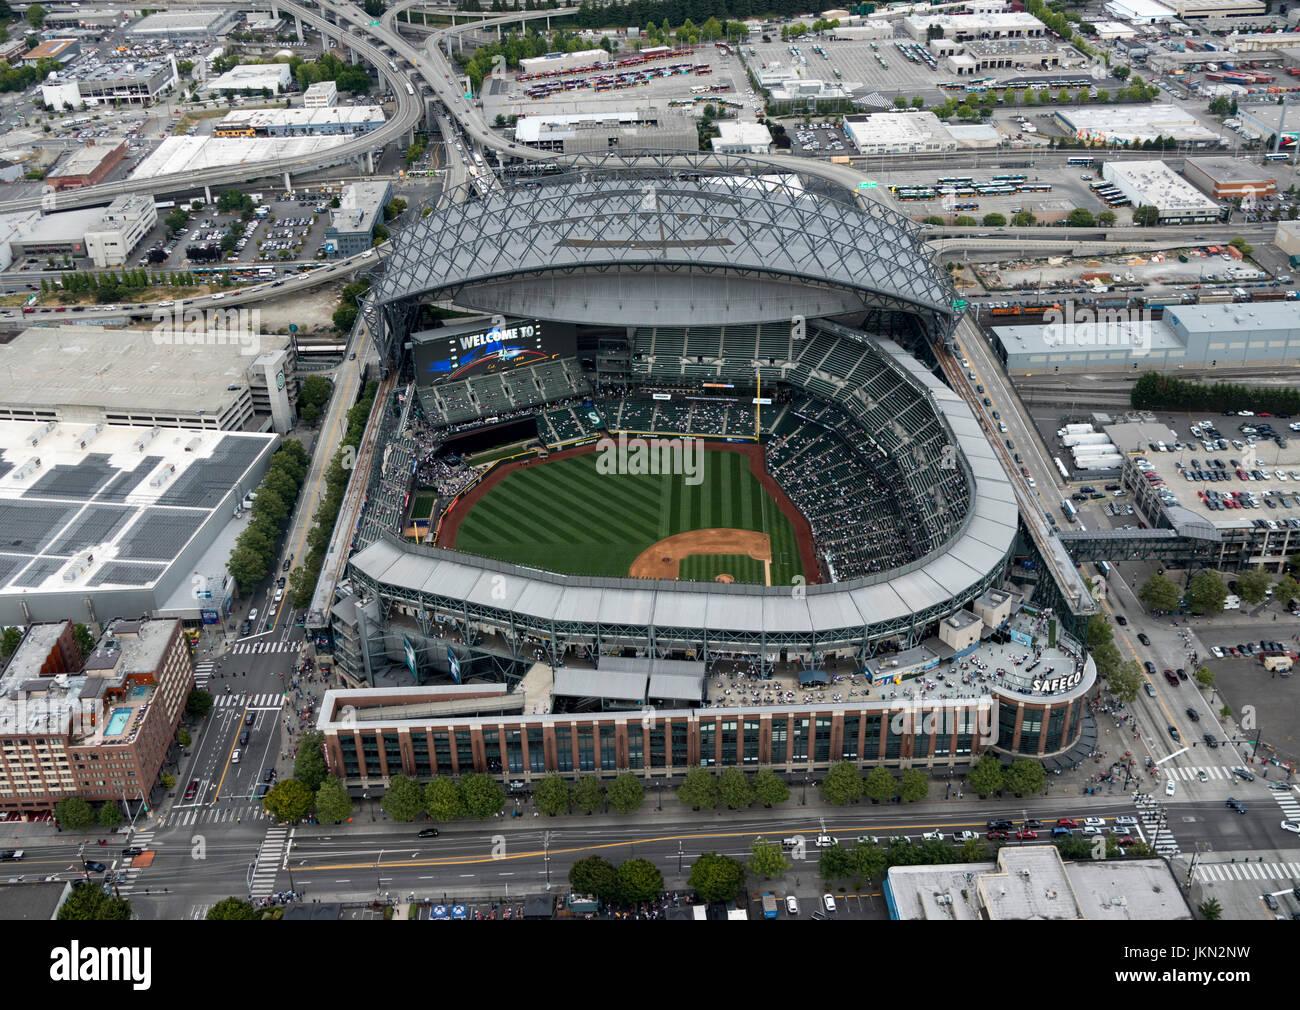 aerial view of Safeco Field retractable roof baseball stadium, Seattle, Washington, USA - Stock Image